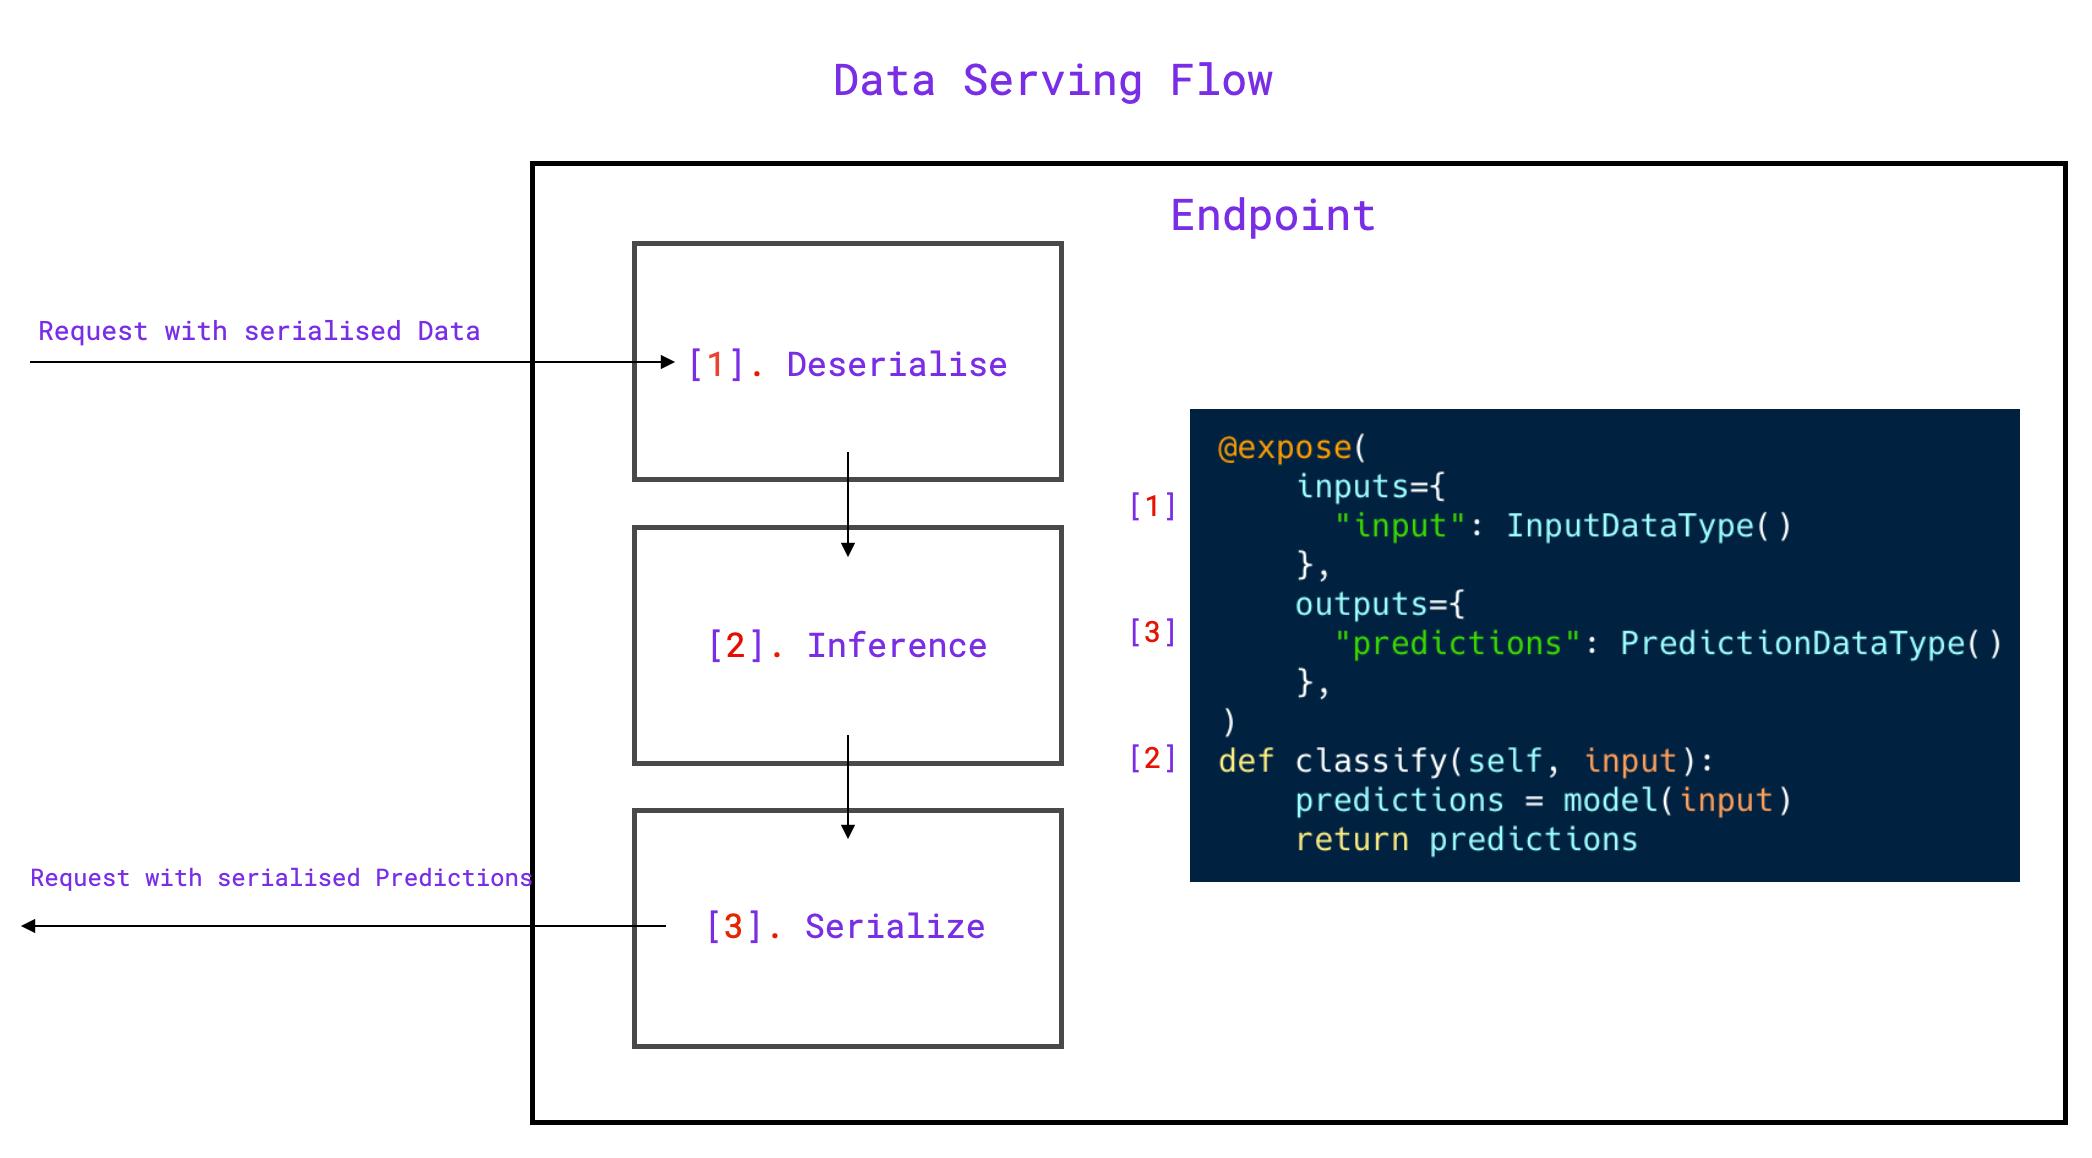 Data Serving Flow